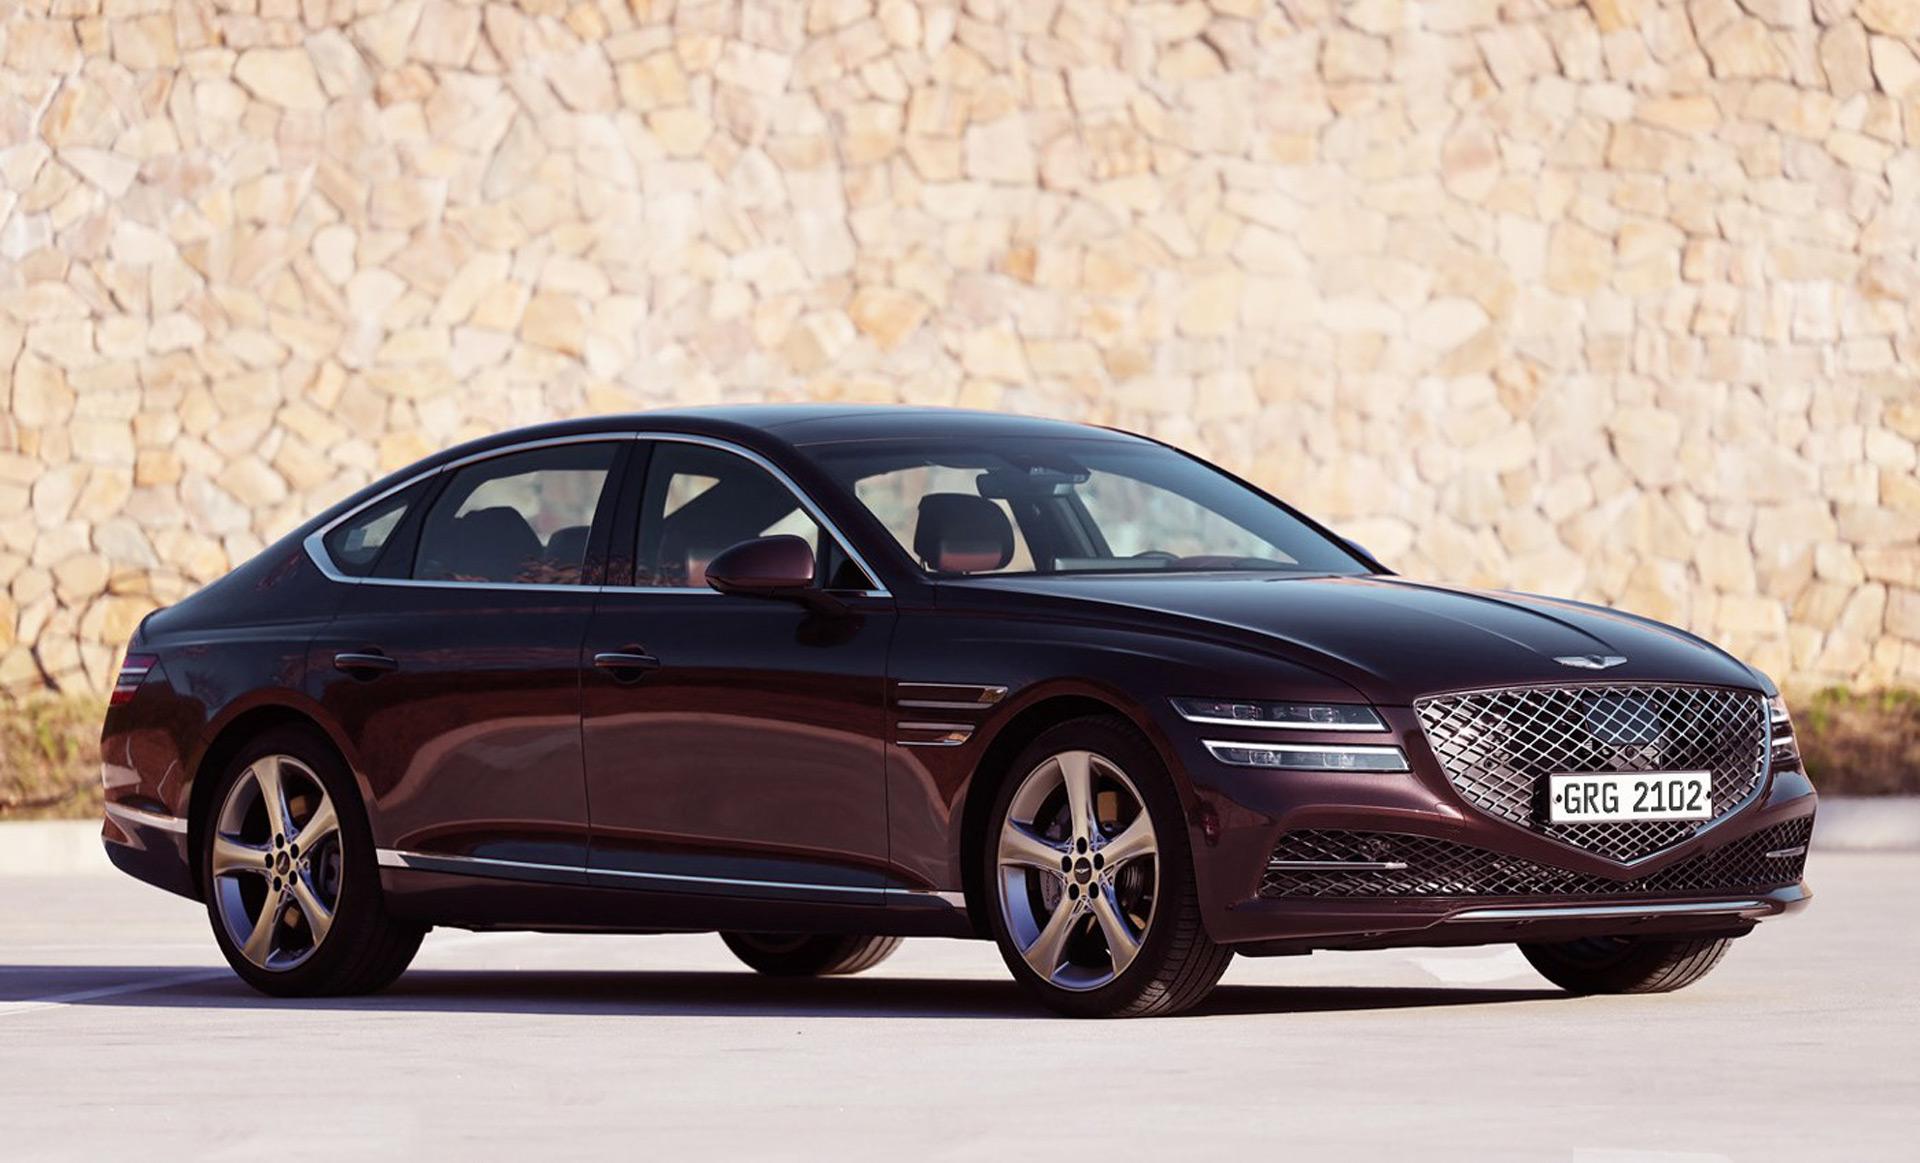 2021 Hyundai Genesis Concept and Review